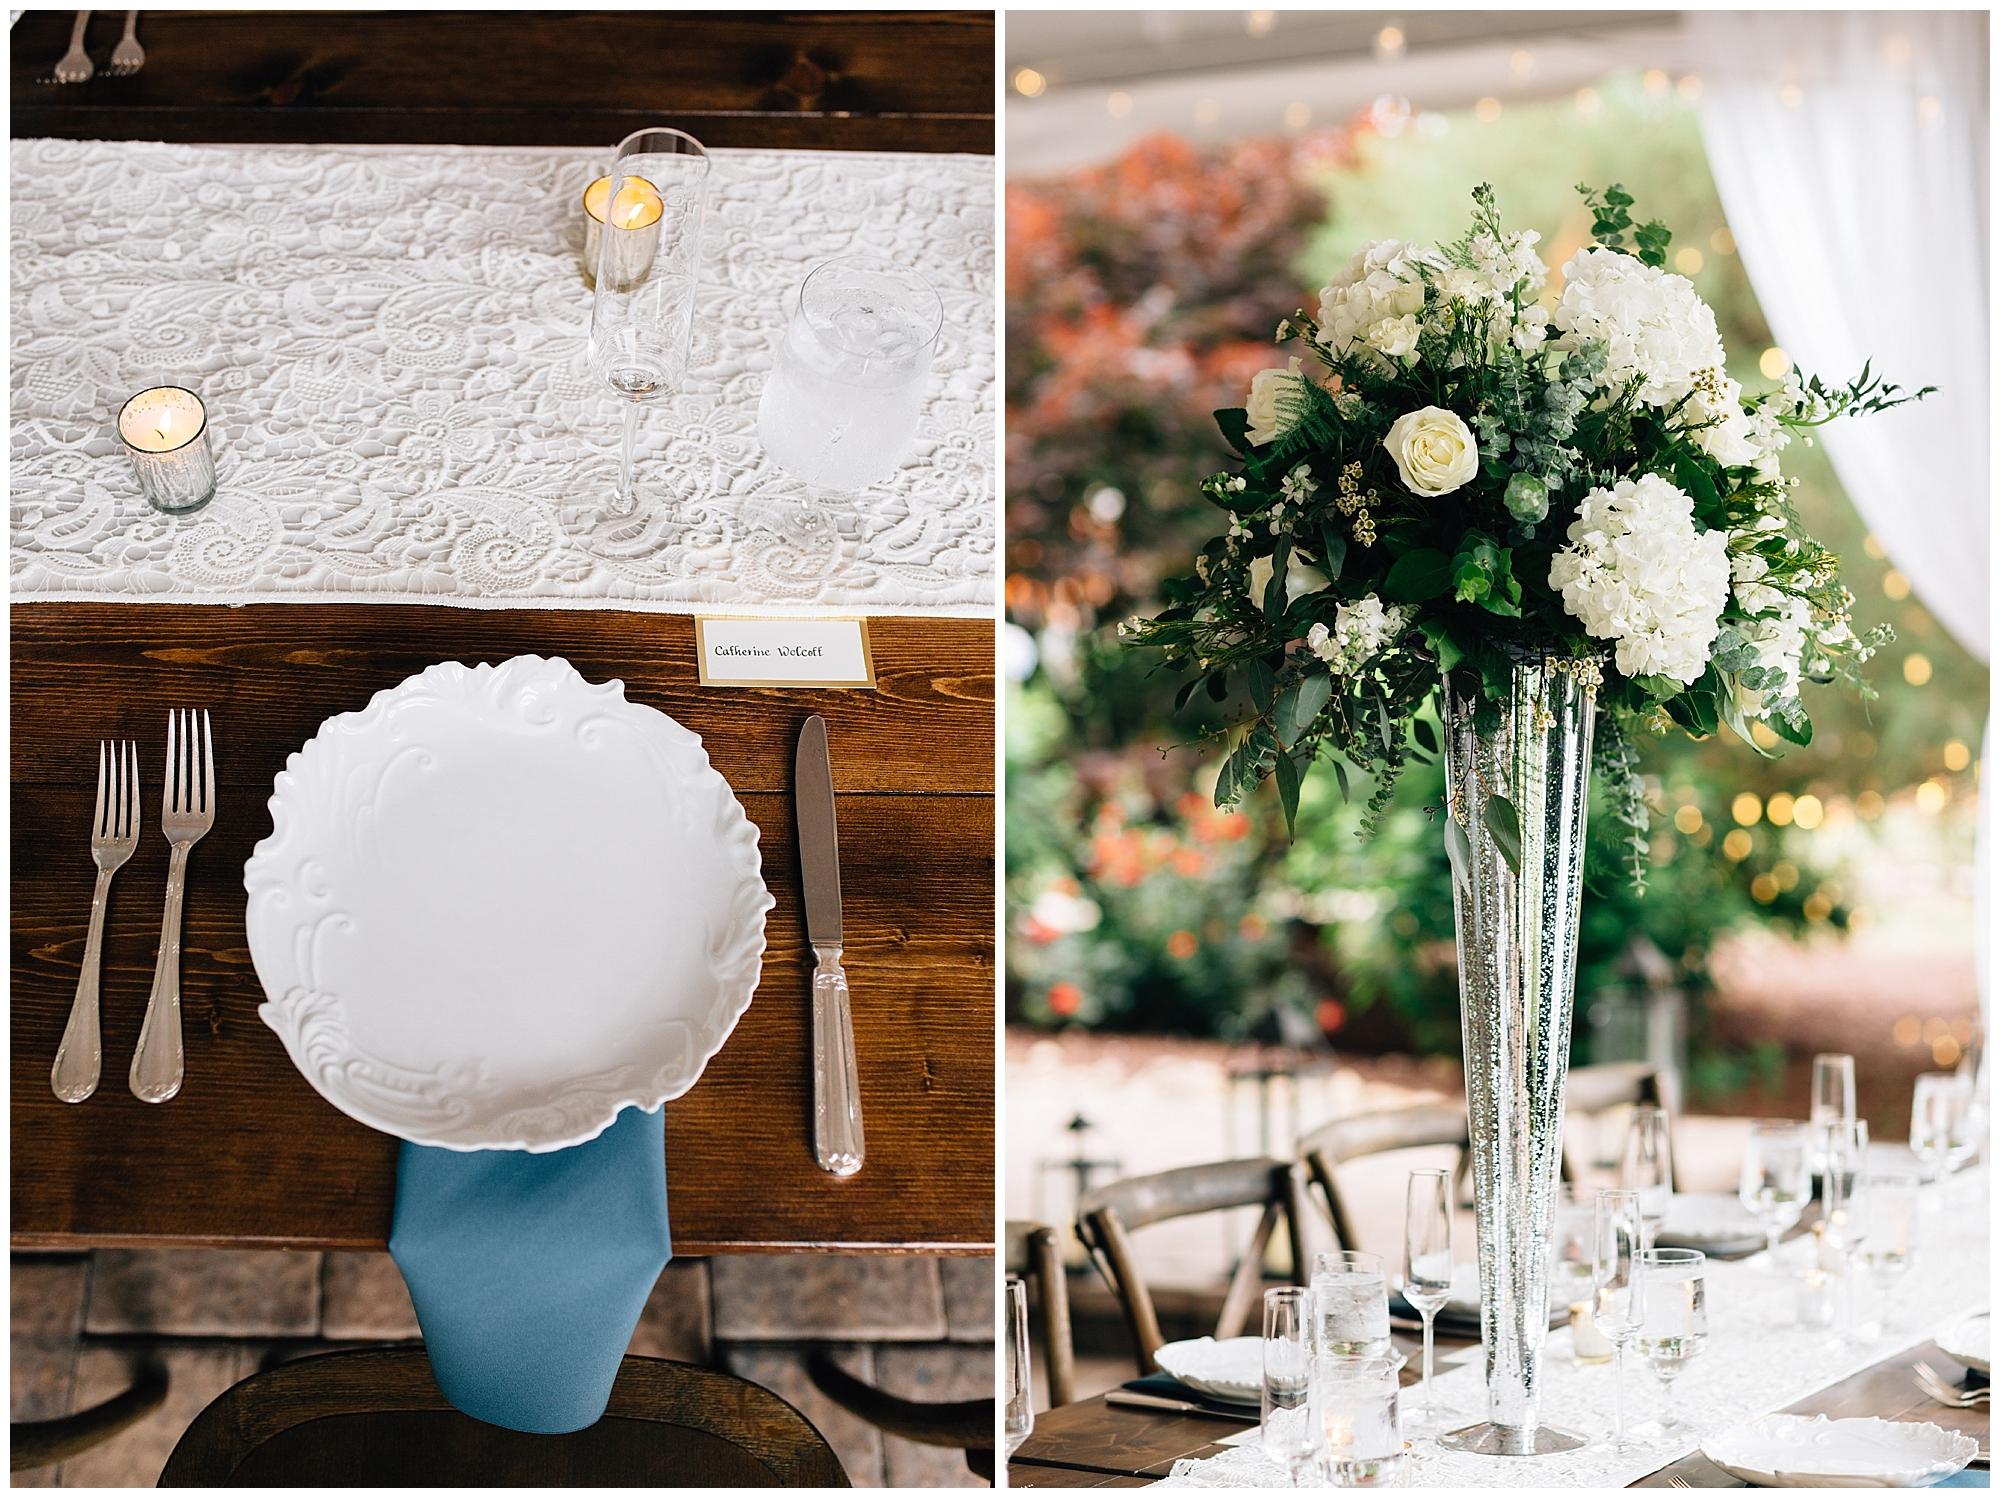 Oaks-at-salem-wedding-apex-photography-71.jpg